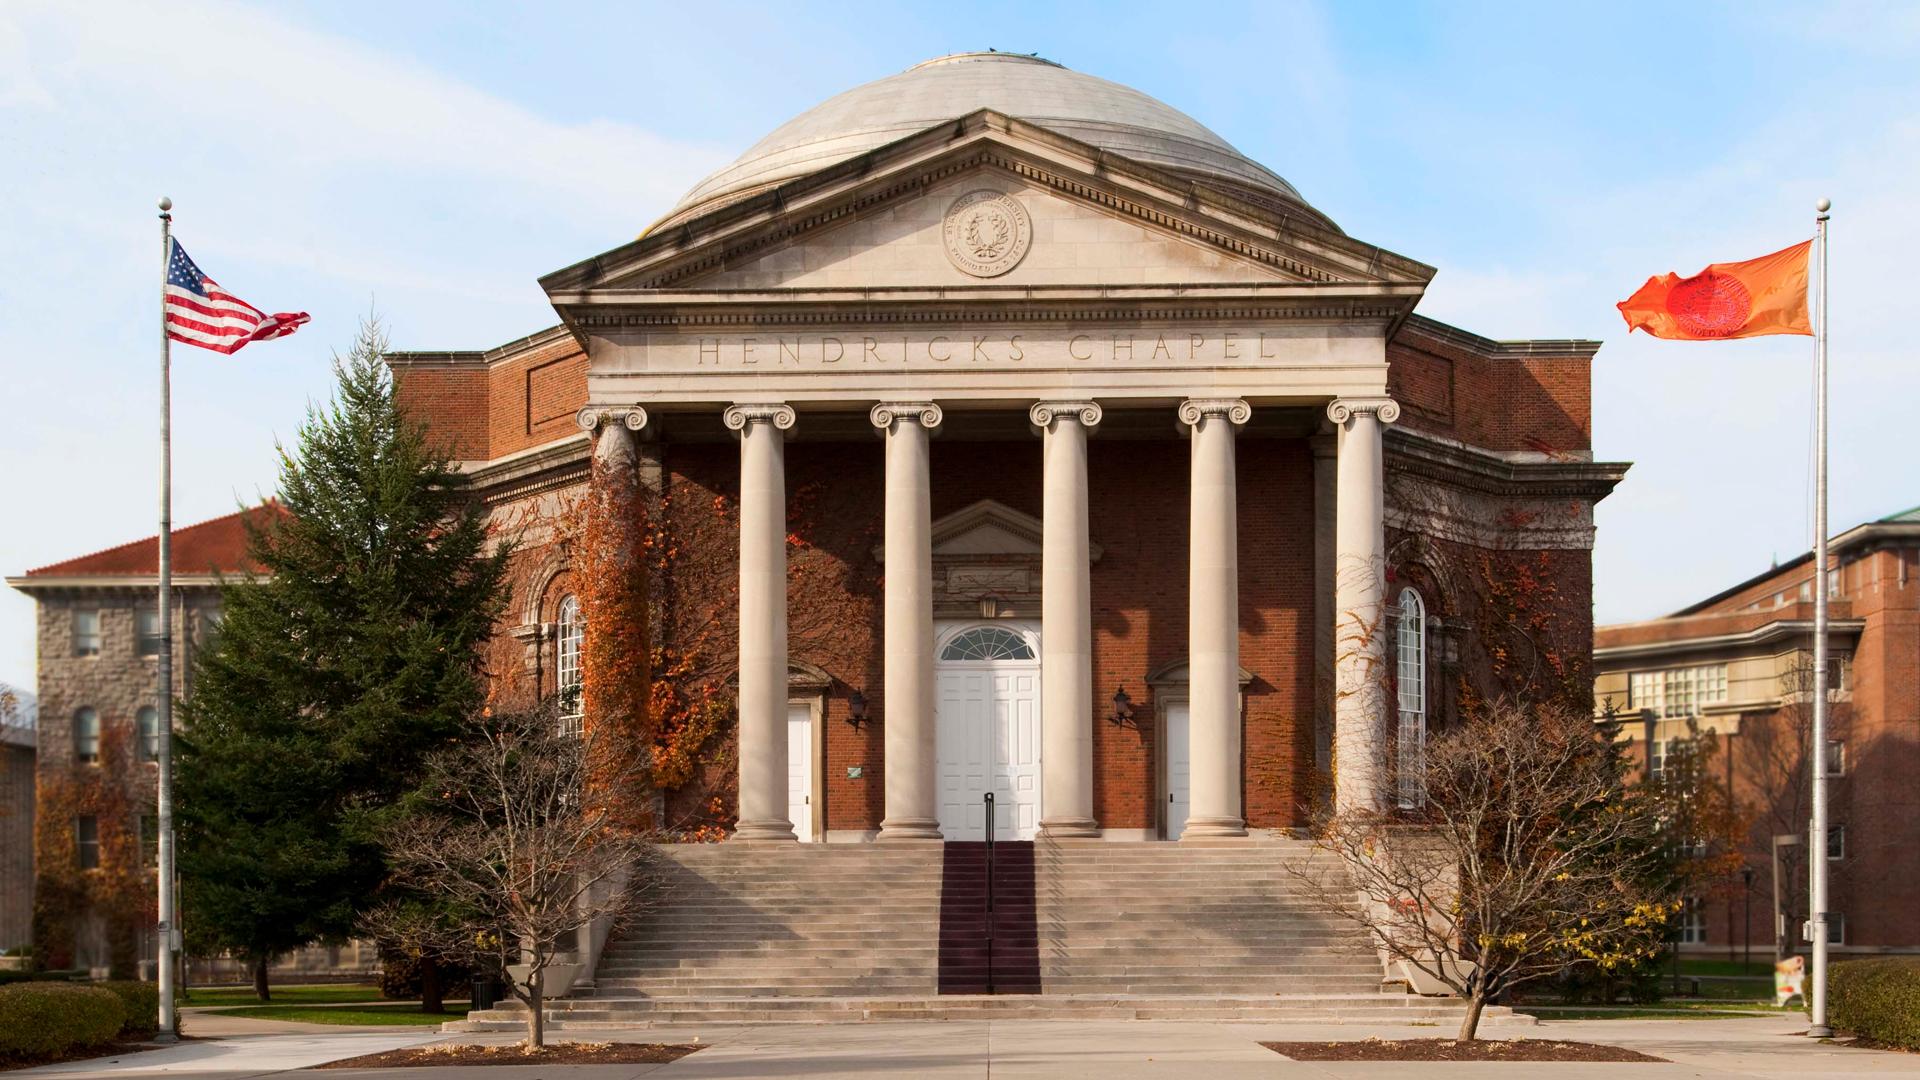 Hendricks Chapel adapts as young adults redefine modern spirituality